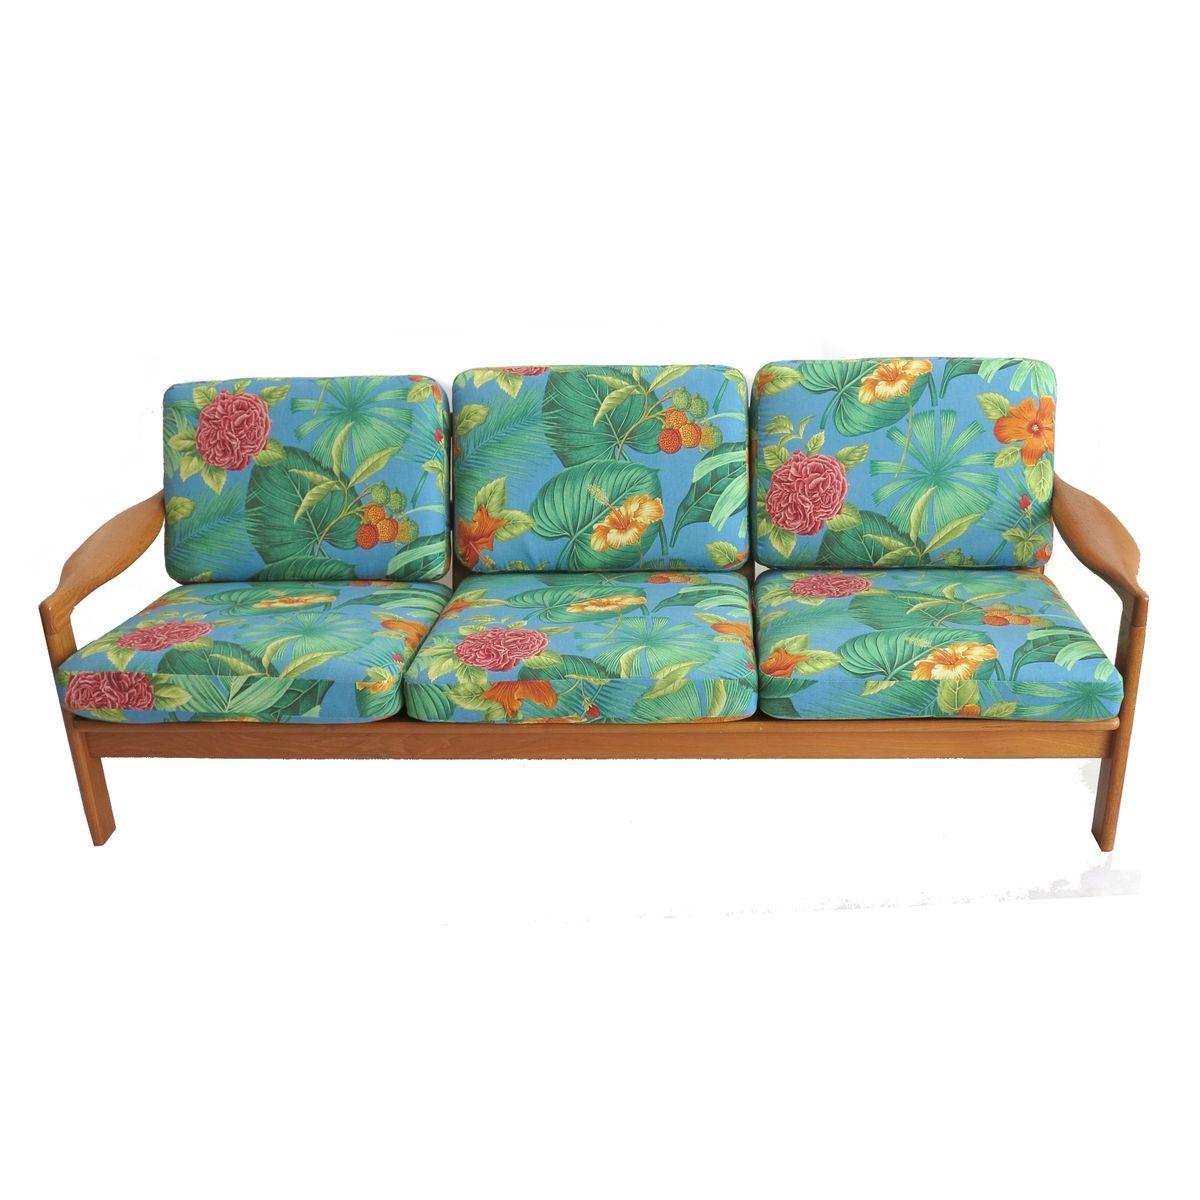 skandinavisches 3 sitzer sofa bei pamono kaufen. Black Bedroom Furniture Sets. Home Design Ideas